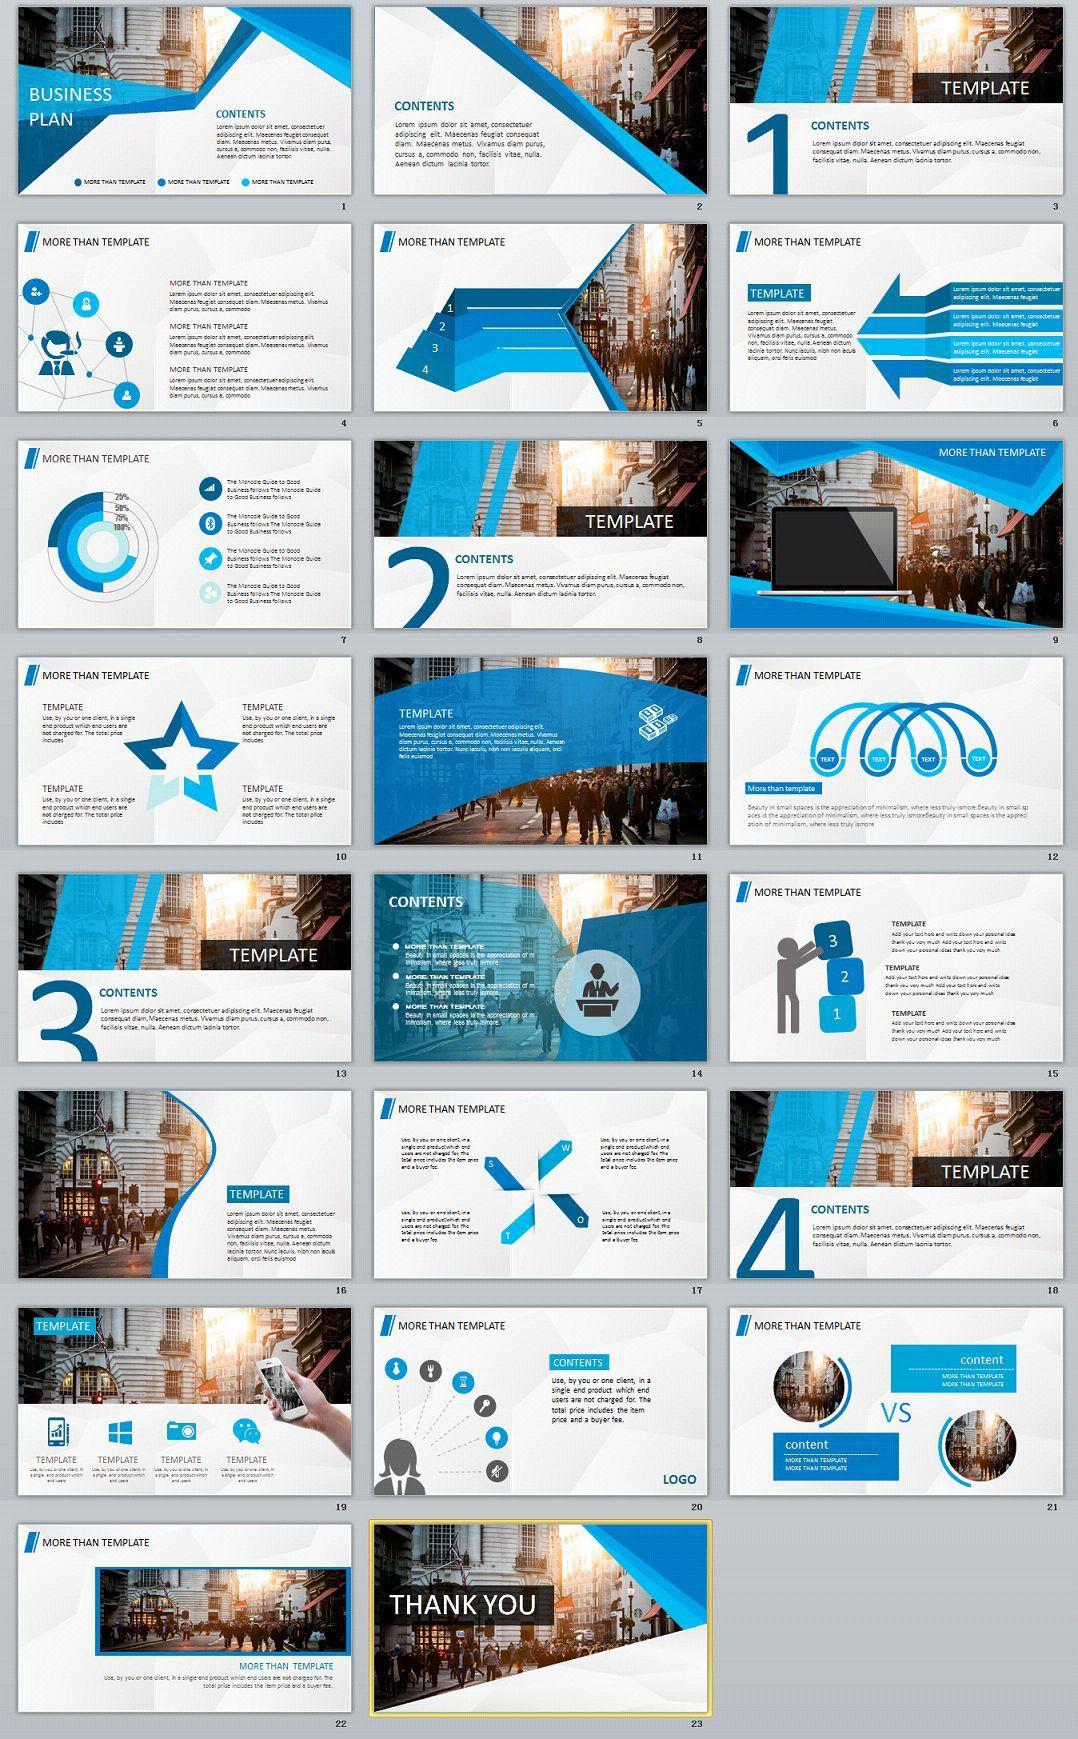 005 Stunning Free Busines Plan Powerpoint Template Download High Definition  Modern UltimateFull